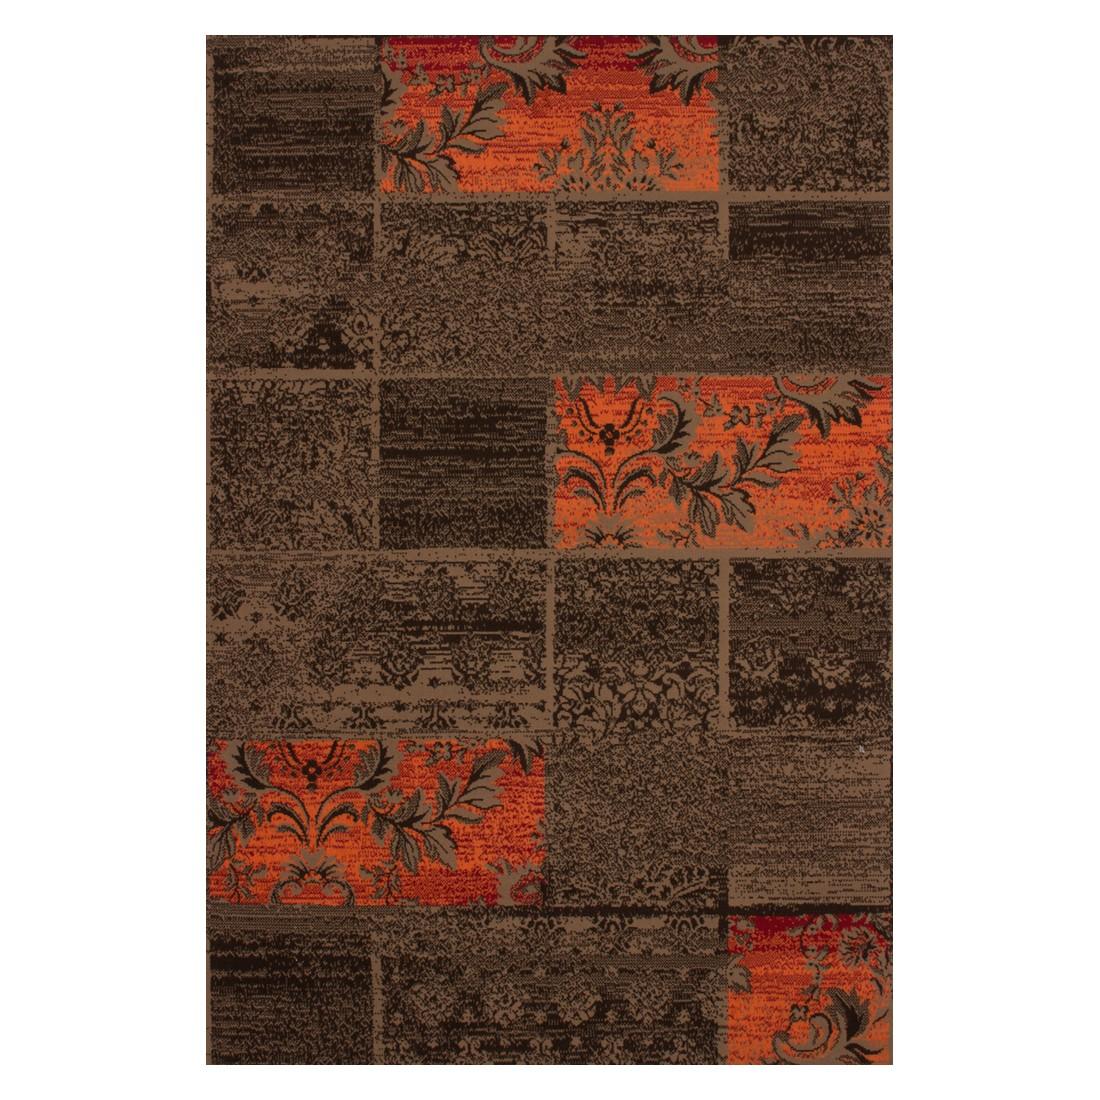 Teppich Freedom – Braun – 190 x 280 cm, Kayoom jetzt kaufen